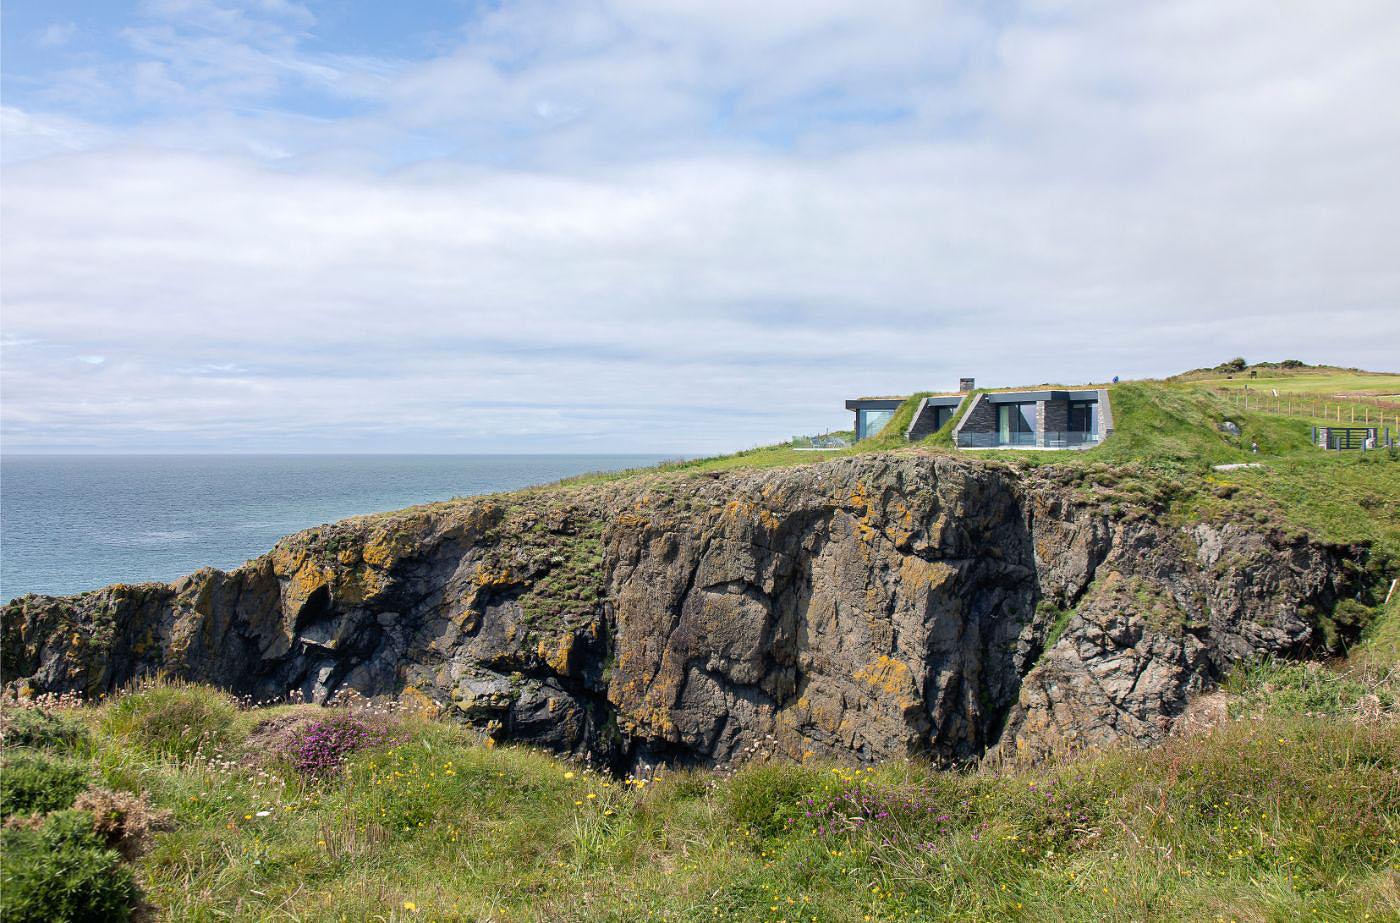 cliffs of Portpatrick, Scotland.